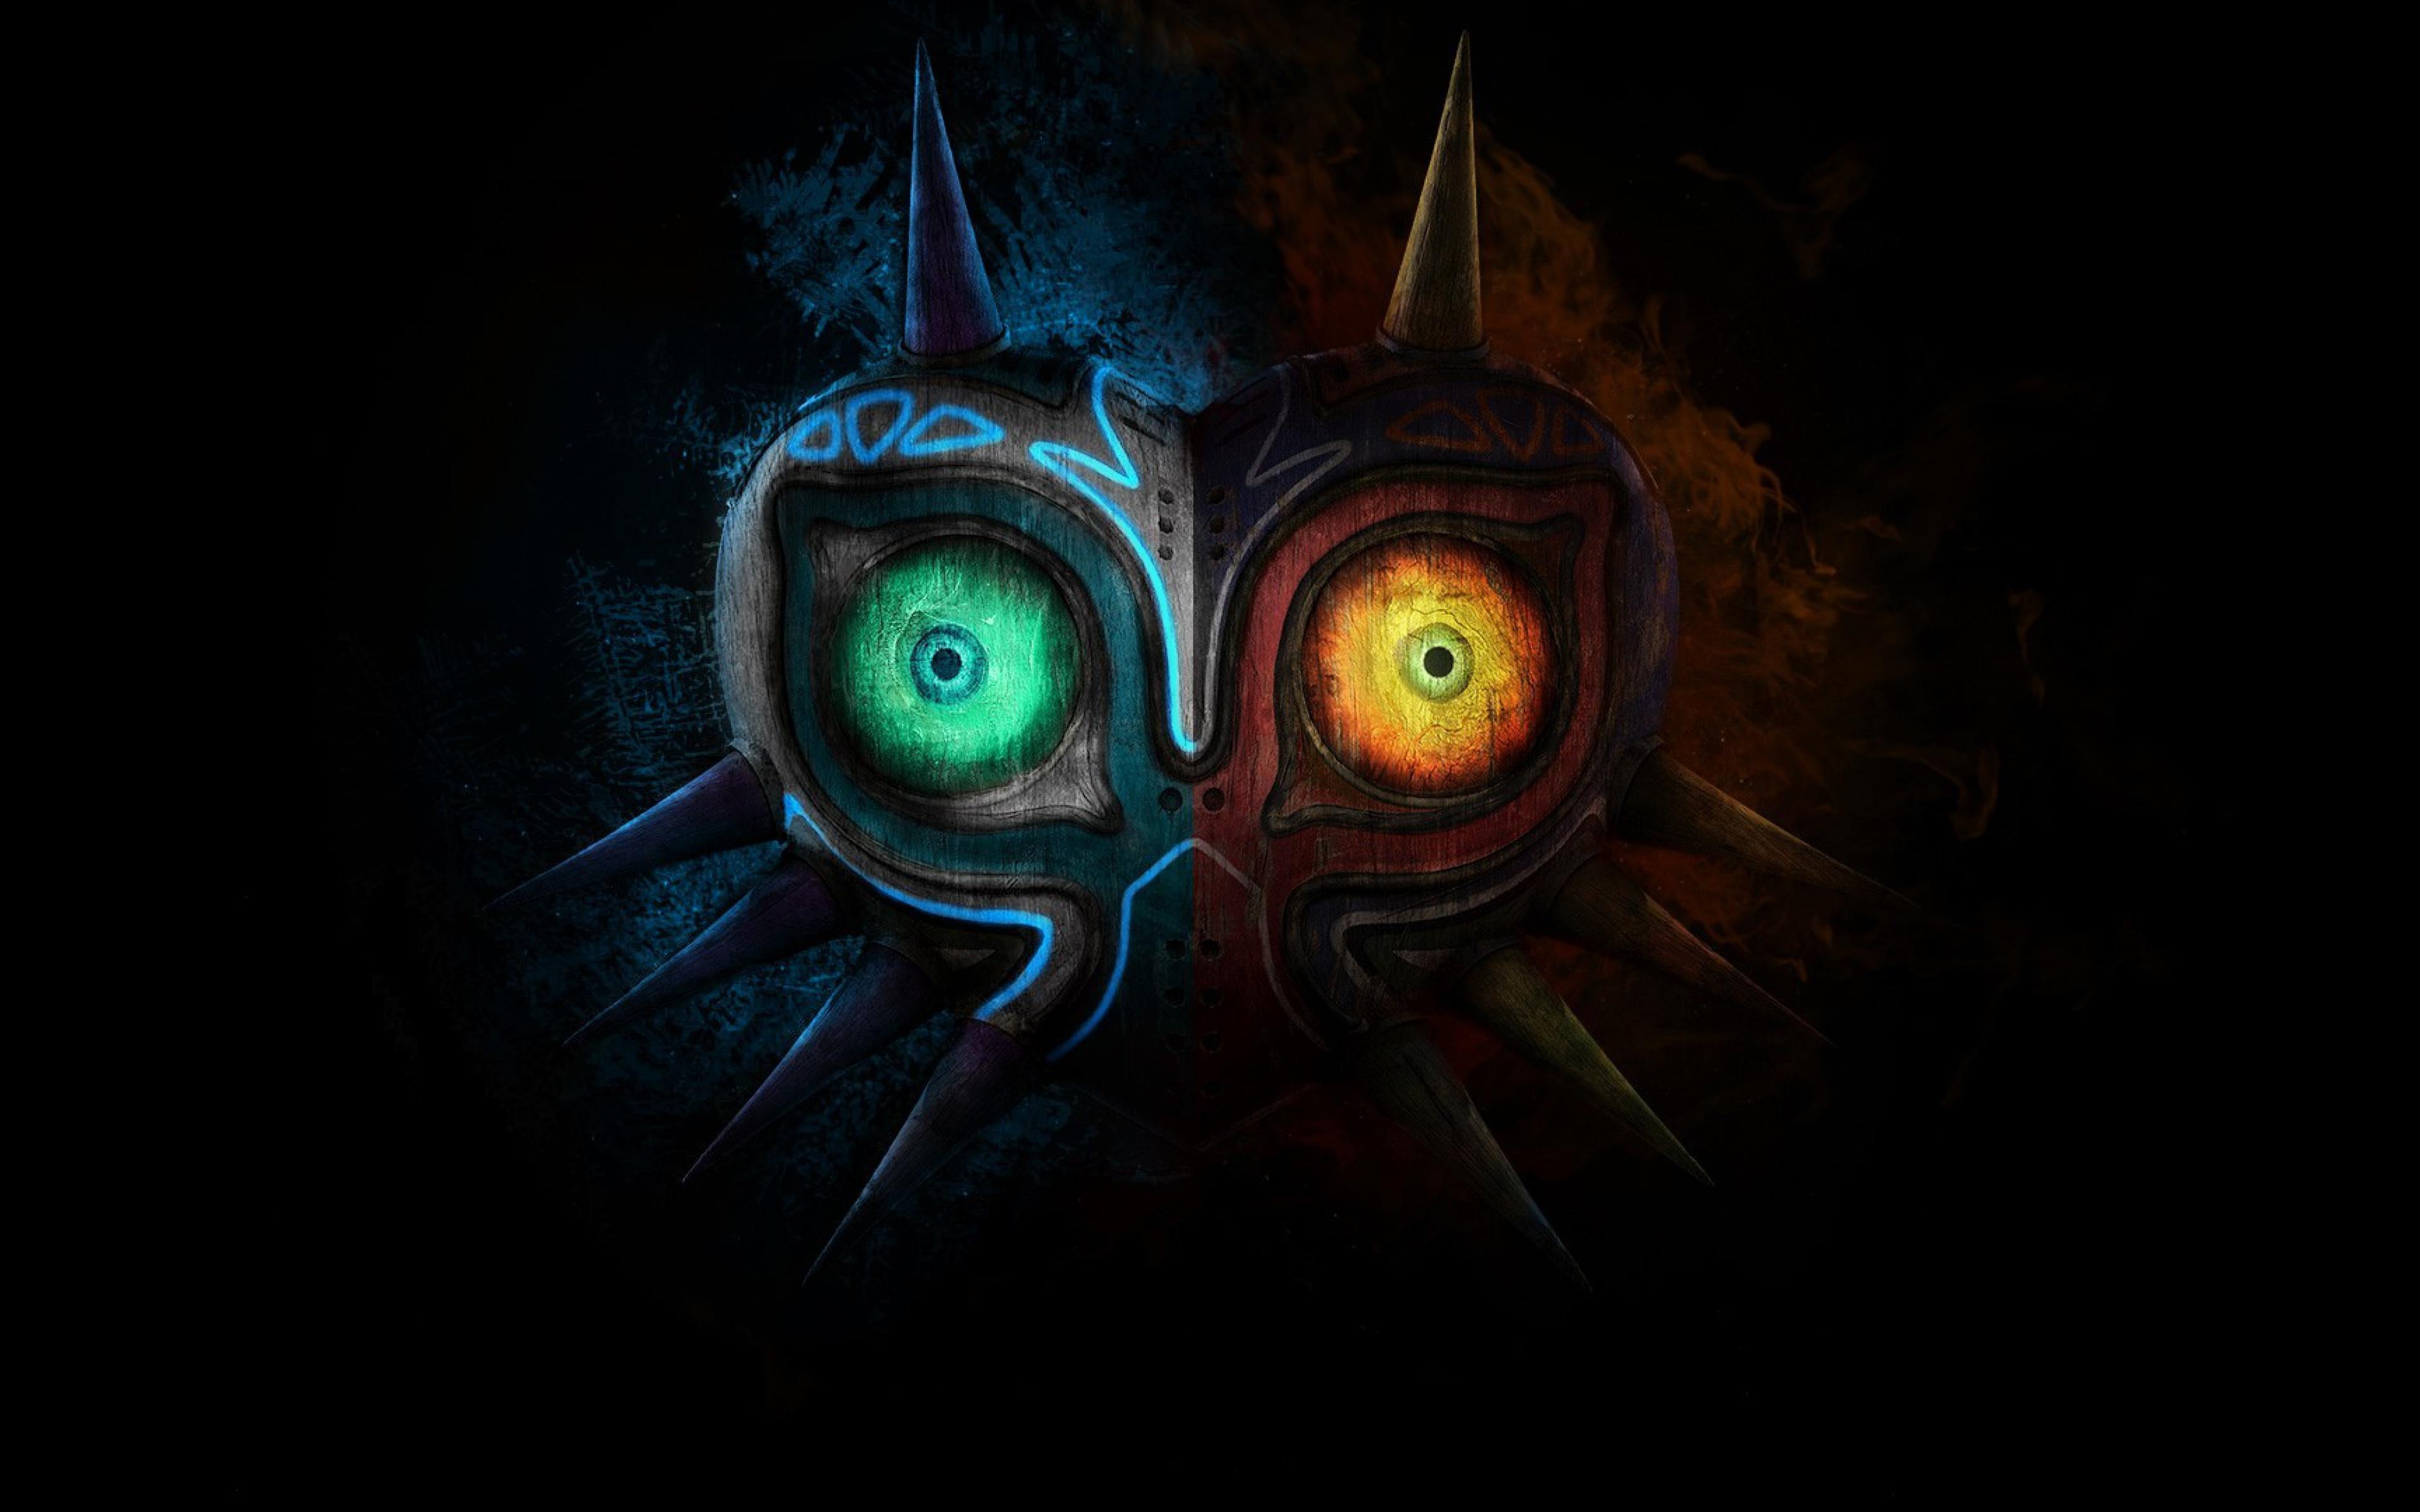 Legend of Zelda Majora Mask Art Game Logo Wallpaper WallpapersByte 3840x2400